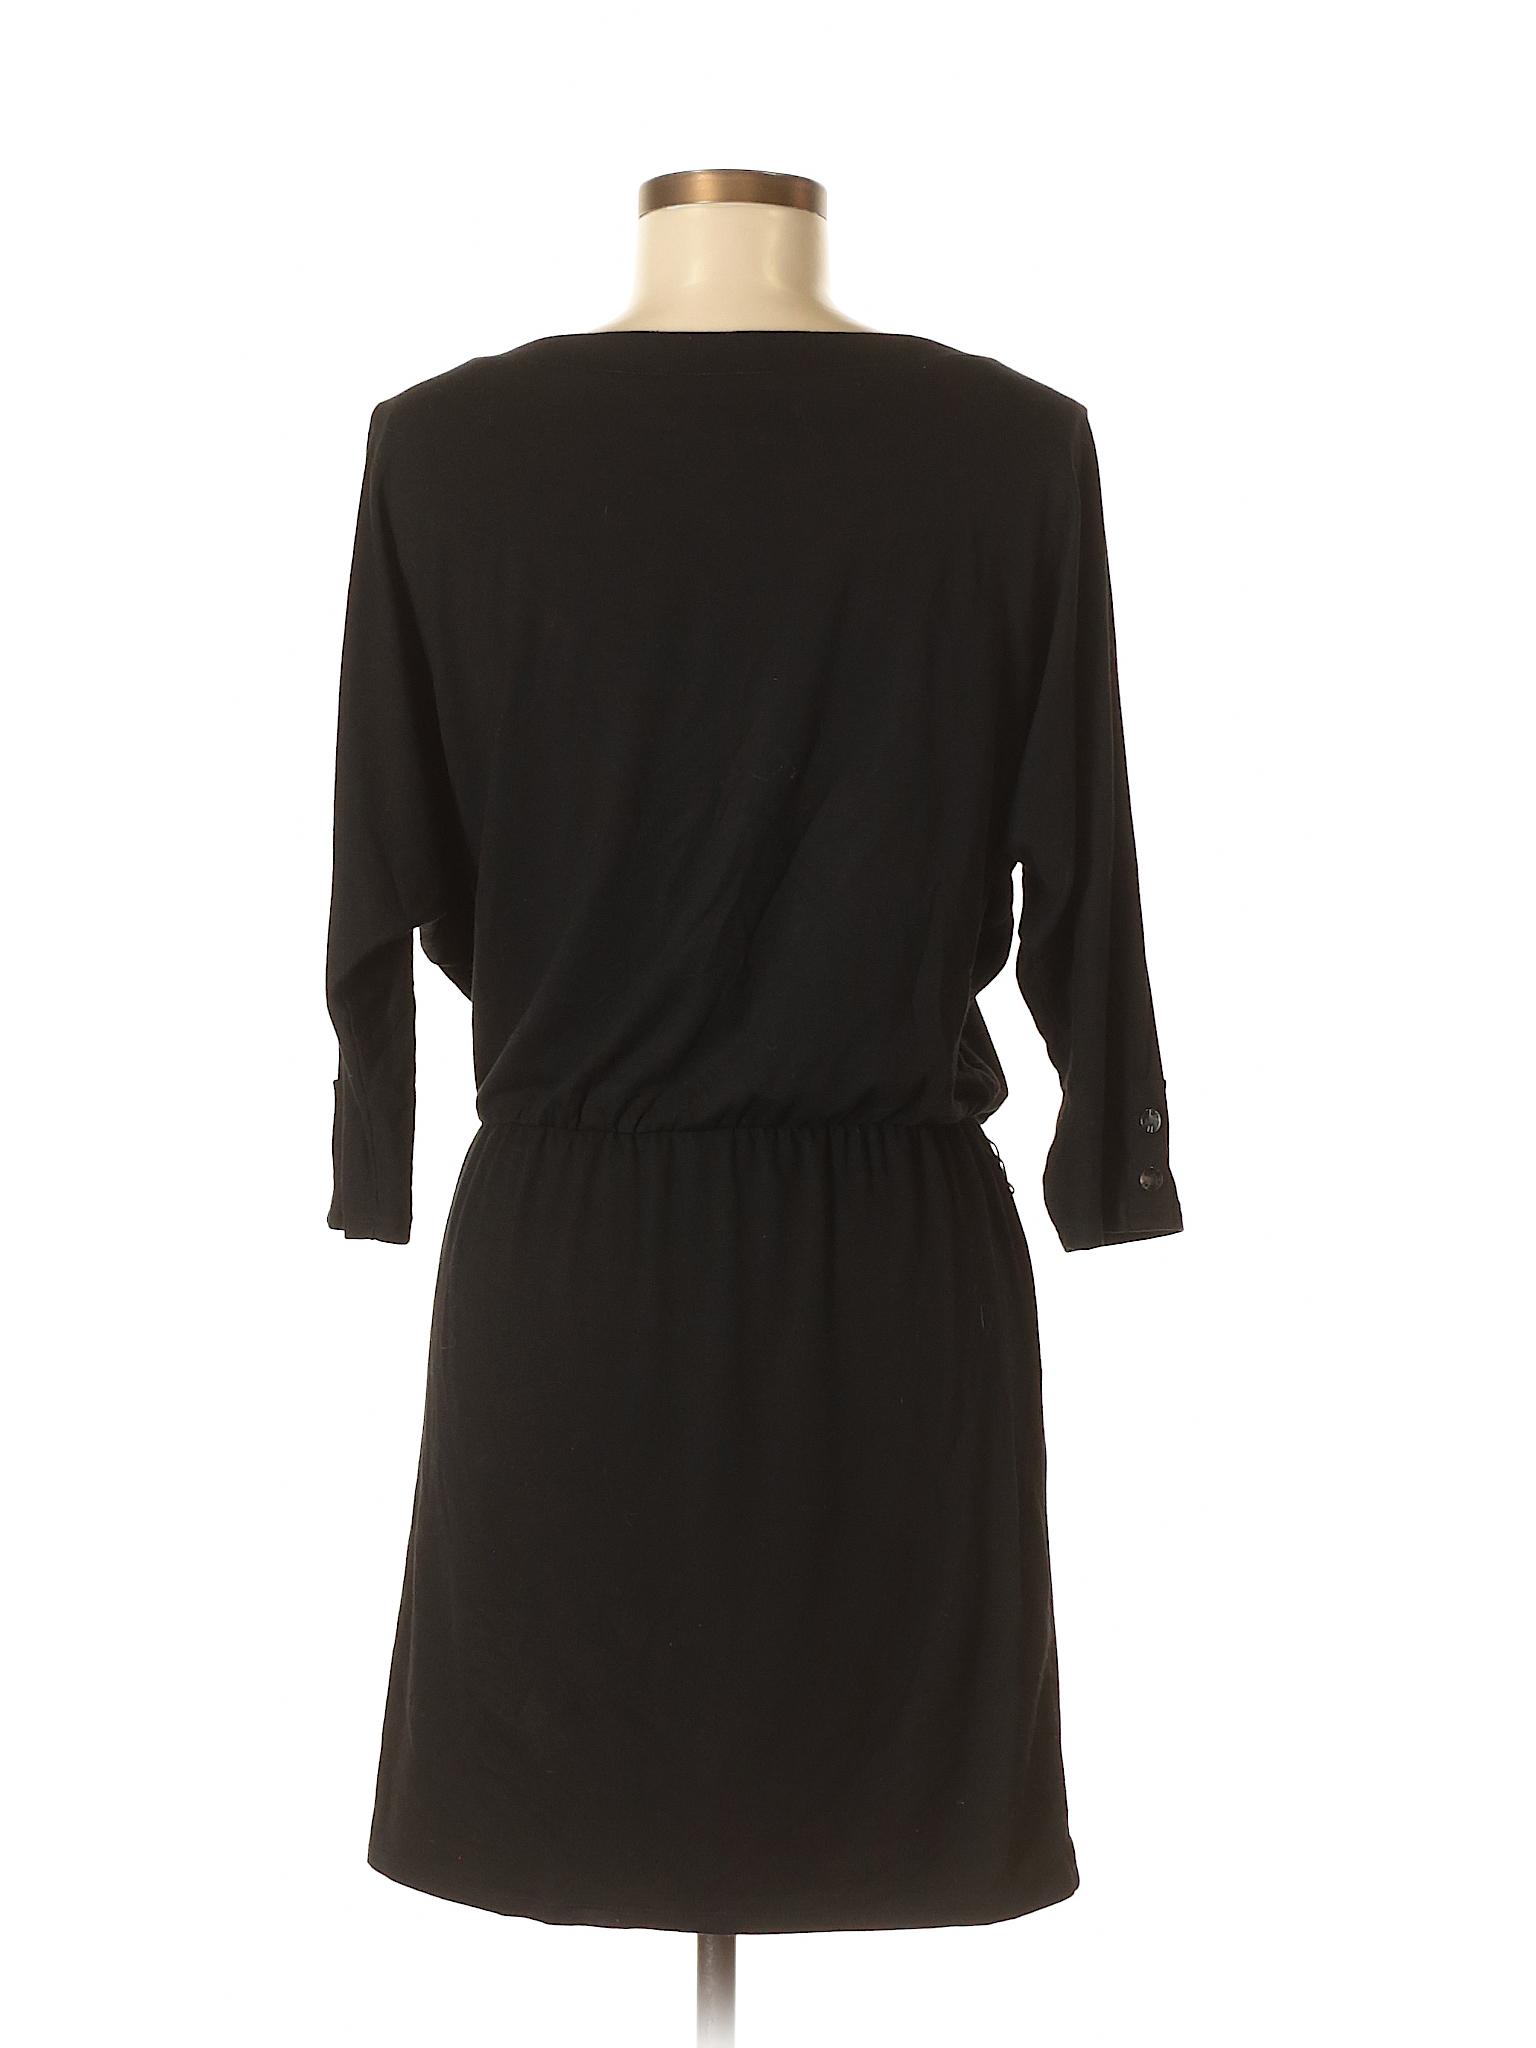 White Dress winter Market House Black Casual Boutique 5qxfA5